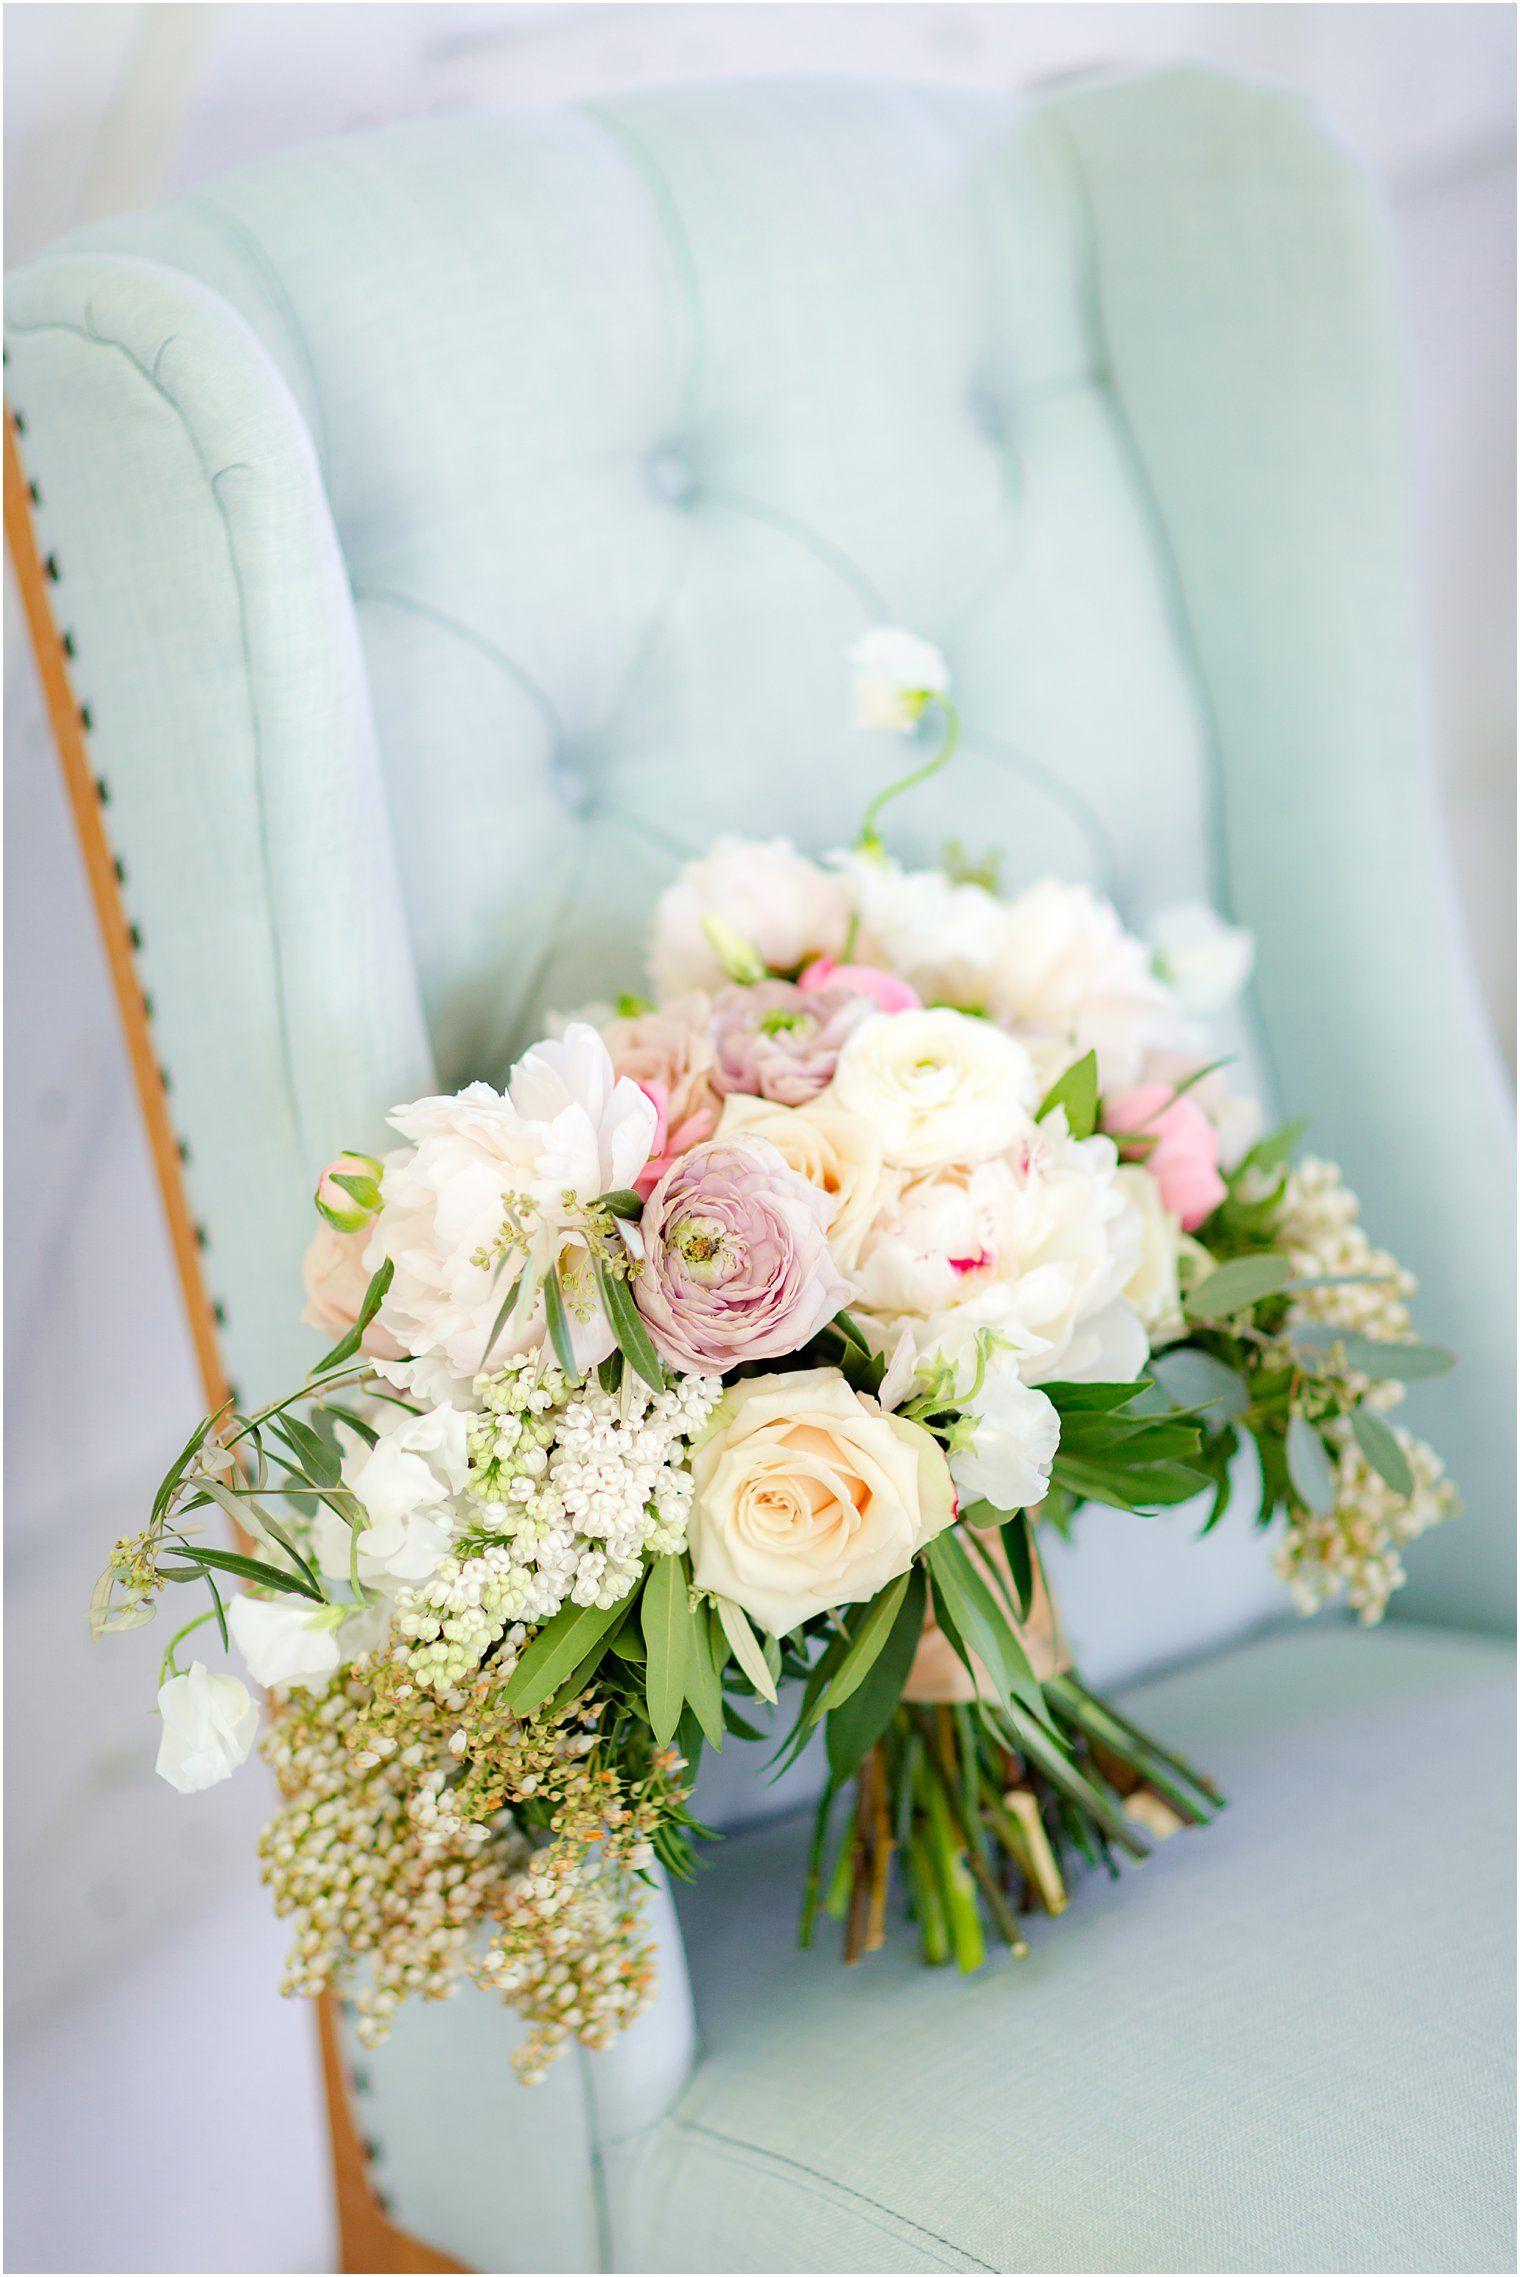 Nj Wedding Florist Bouquet Inspiration Nj Wedding Photographer Idalia Photography In 2020 Nj Weddings Wedding Florist Nj Wedding Photographer